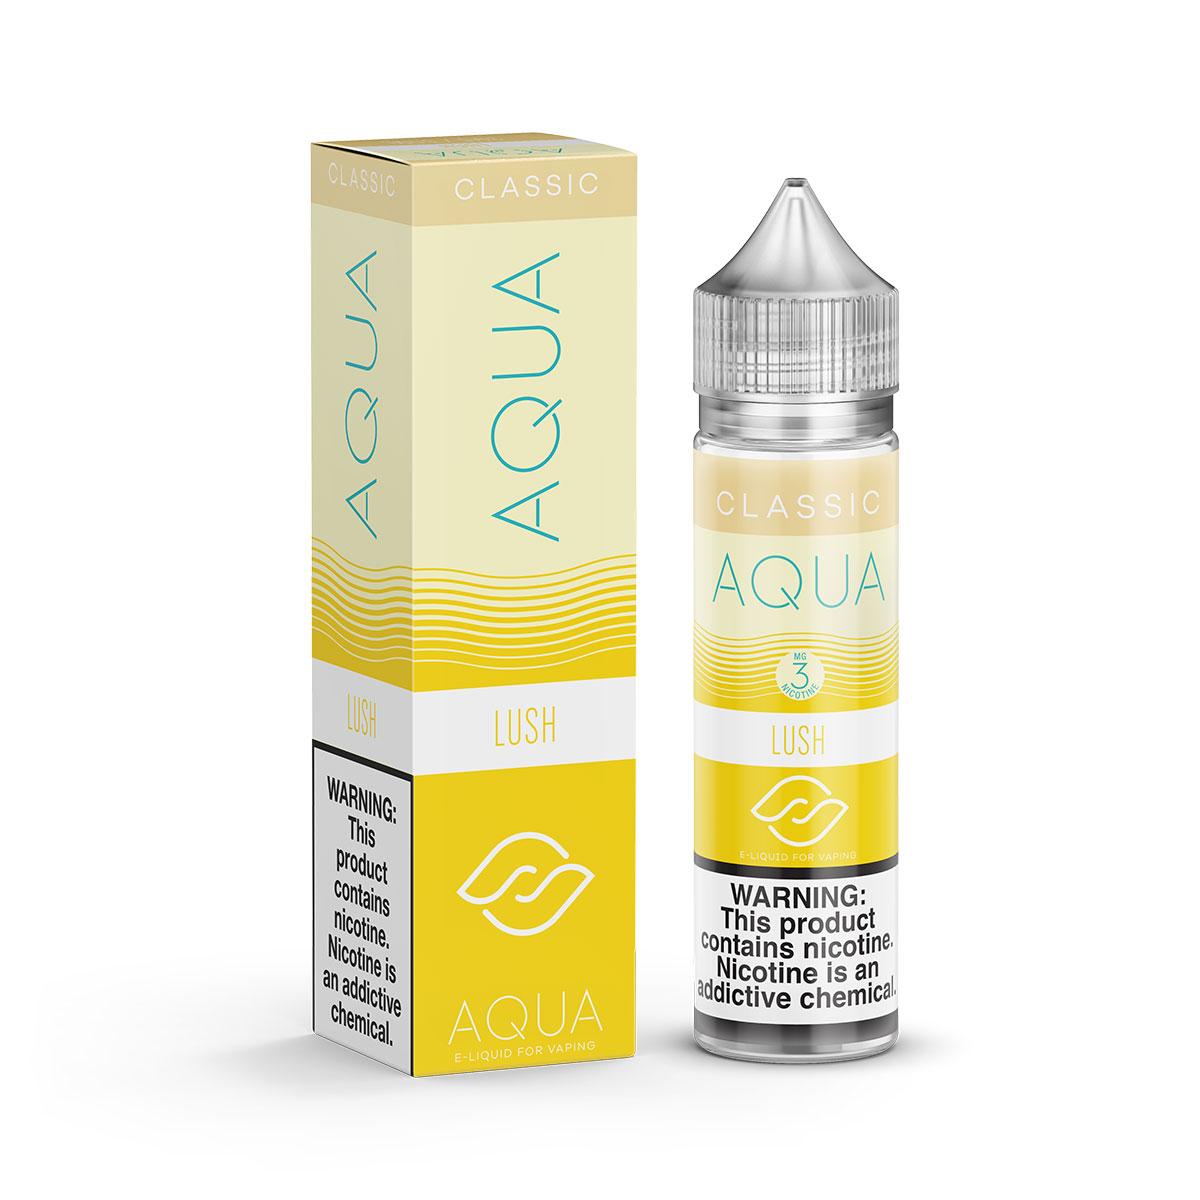 Aqua-Classic-60ml-Lush-3mg.jpg